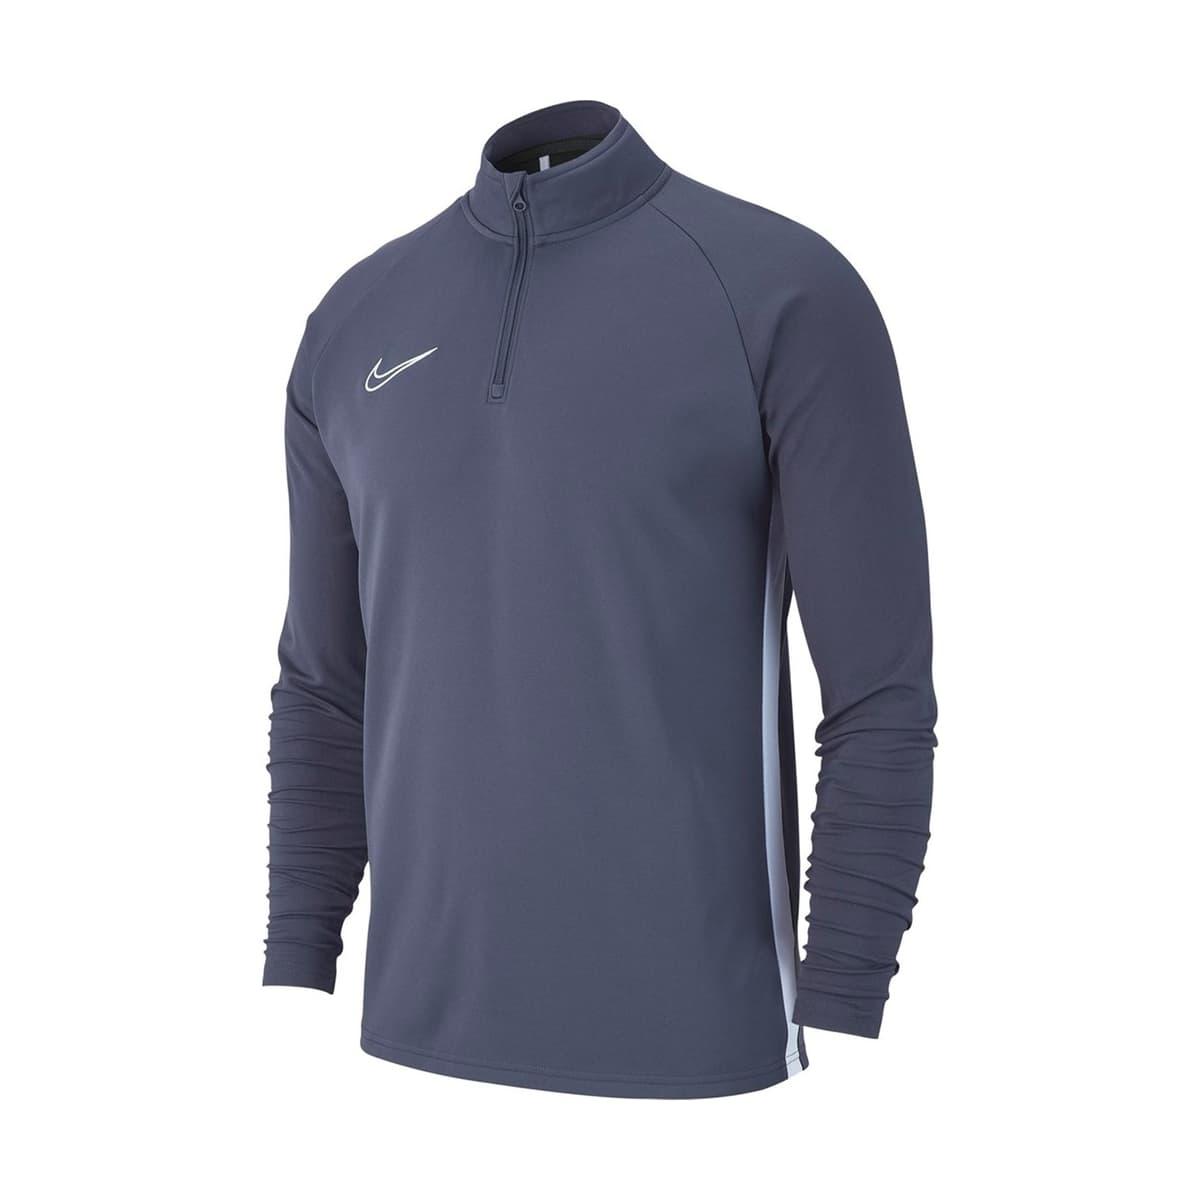 Dry Academy 19 Erkek Gri Sweatshirt (AJ9094-060)